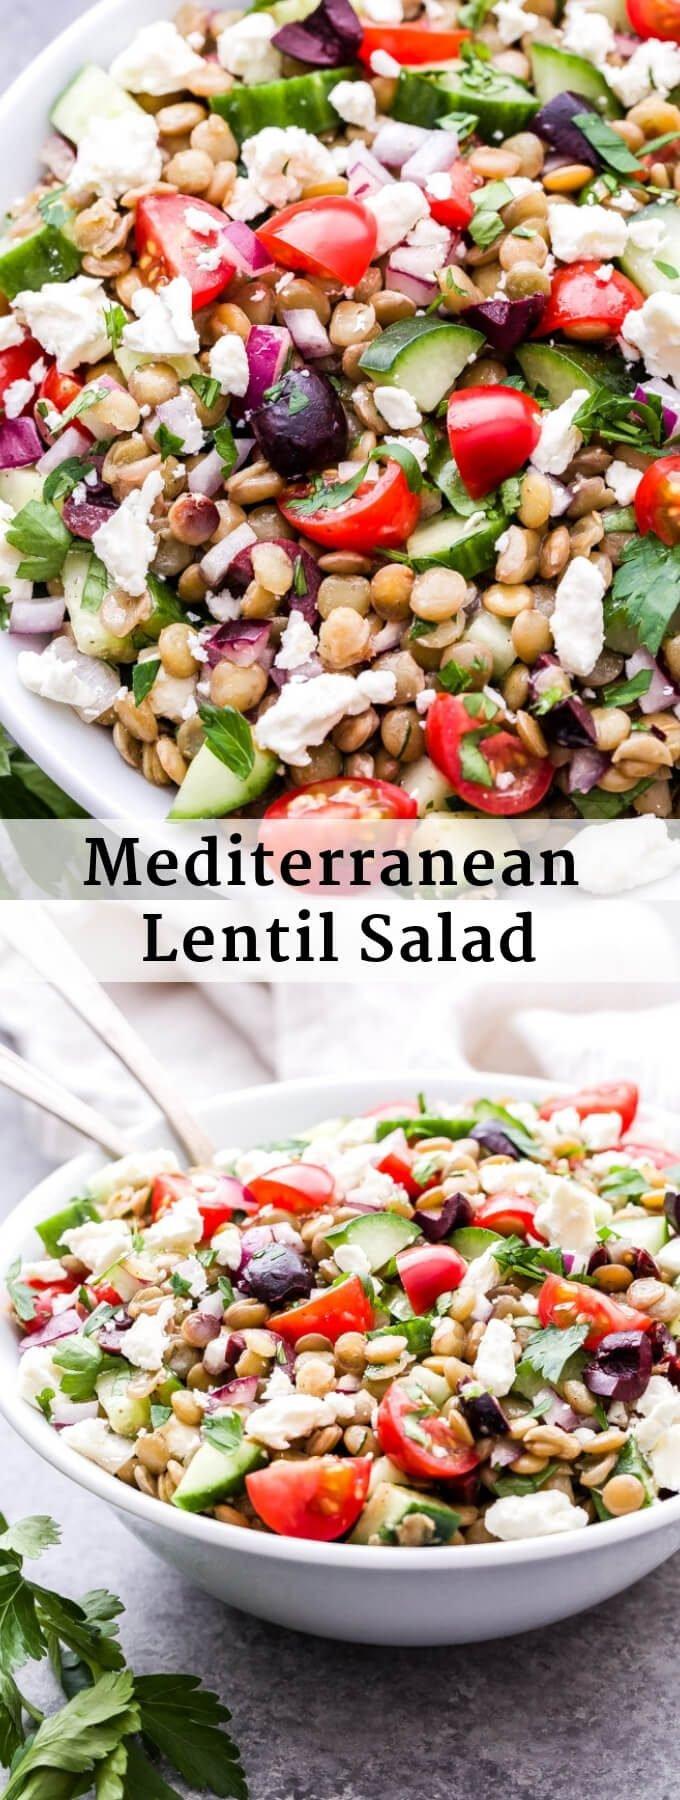 Mediterranean lentil salad pinterest collage